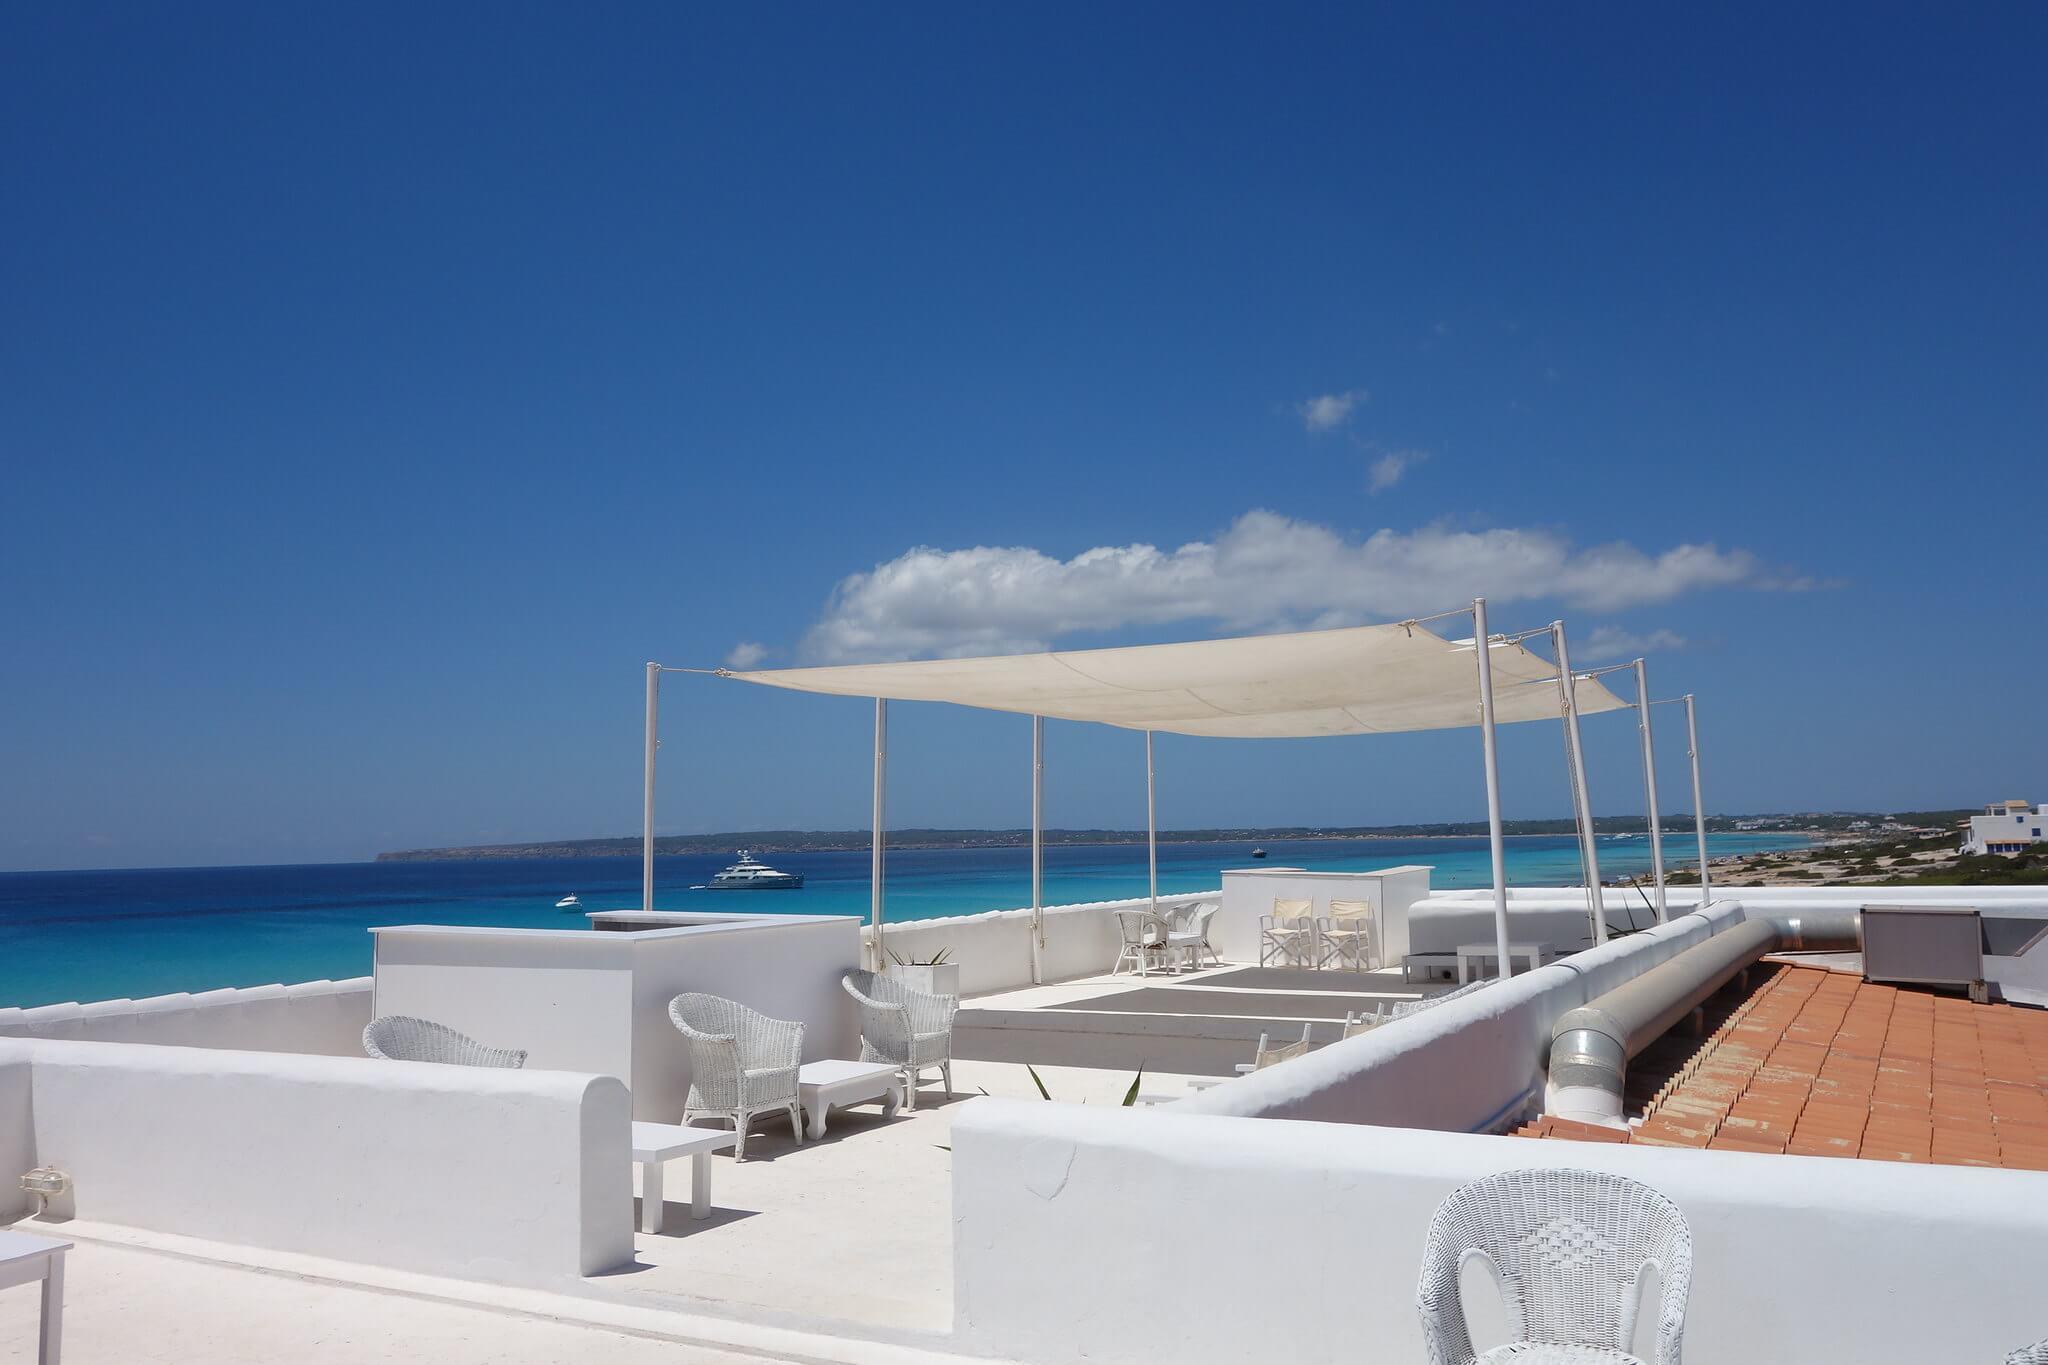 https://www.white-ibiza.com/wp-content/uploads/2020/03/formentera-beach-restaurants-10-punto7-2020-04.jpg